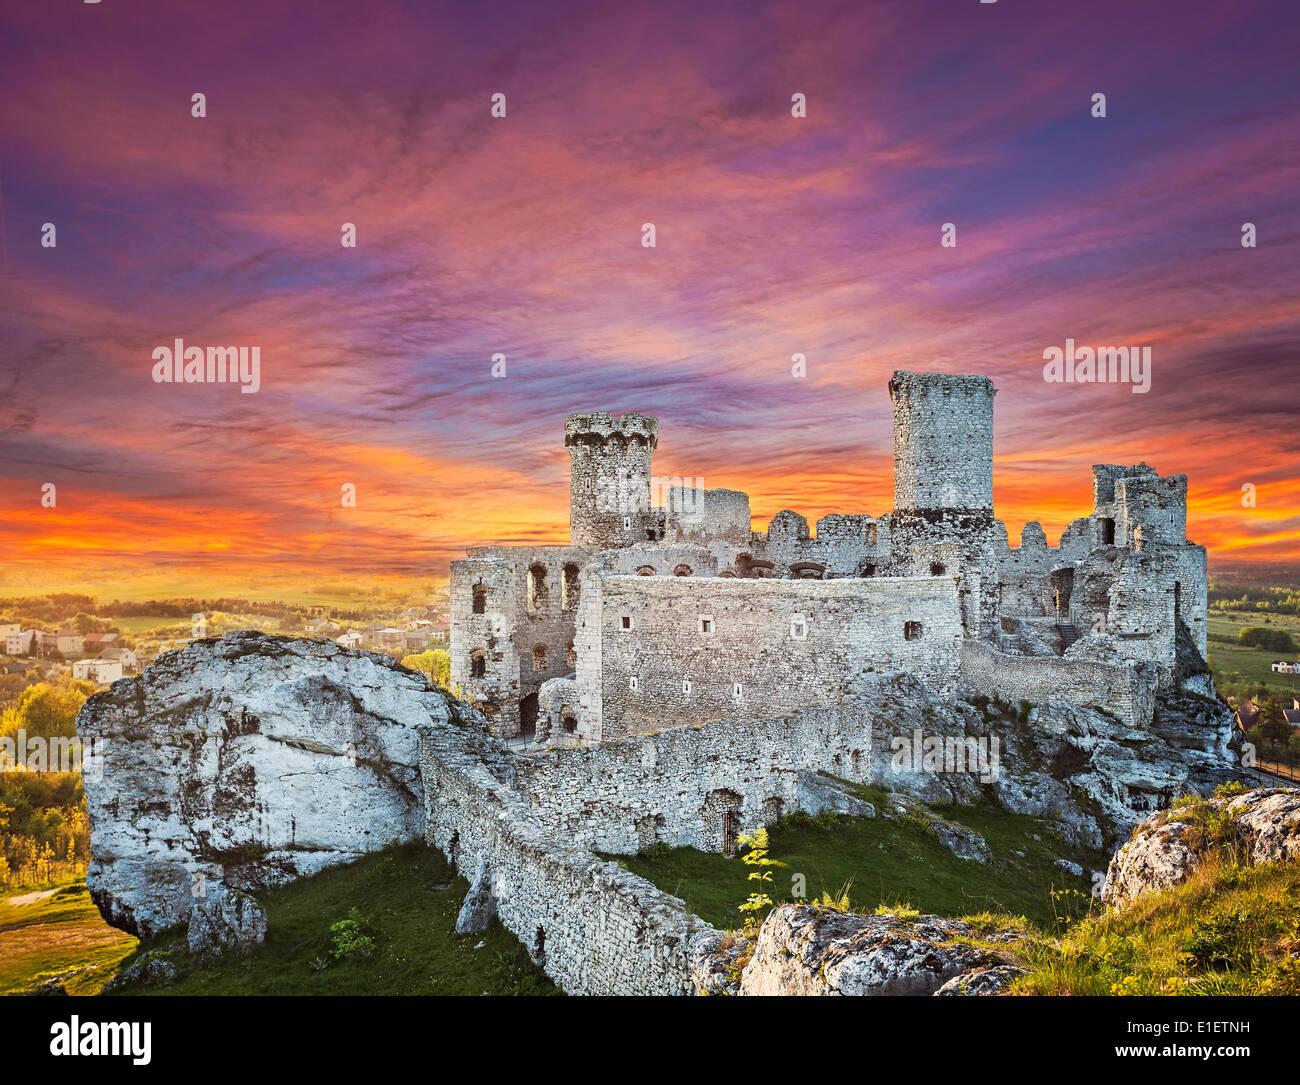 Schöner Sonnenuntergang über Ogrodzieniec Schloss, Polen. Stockbild